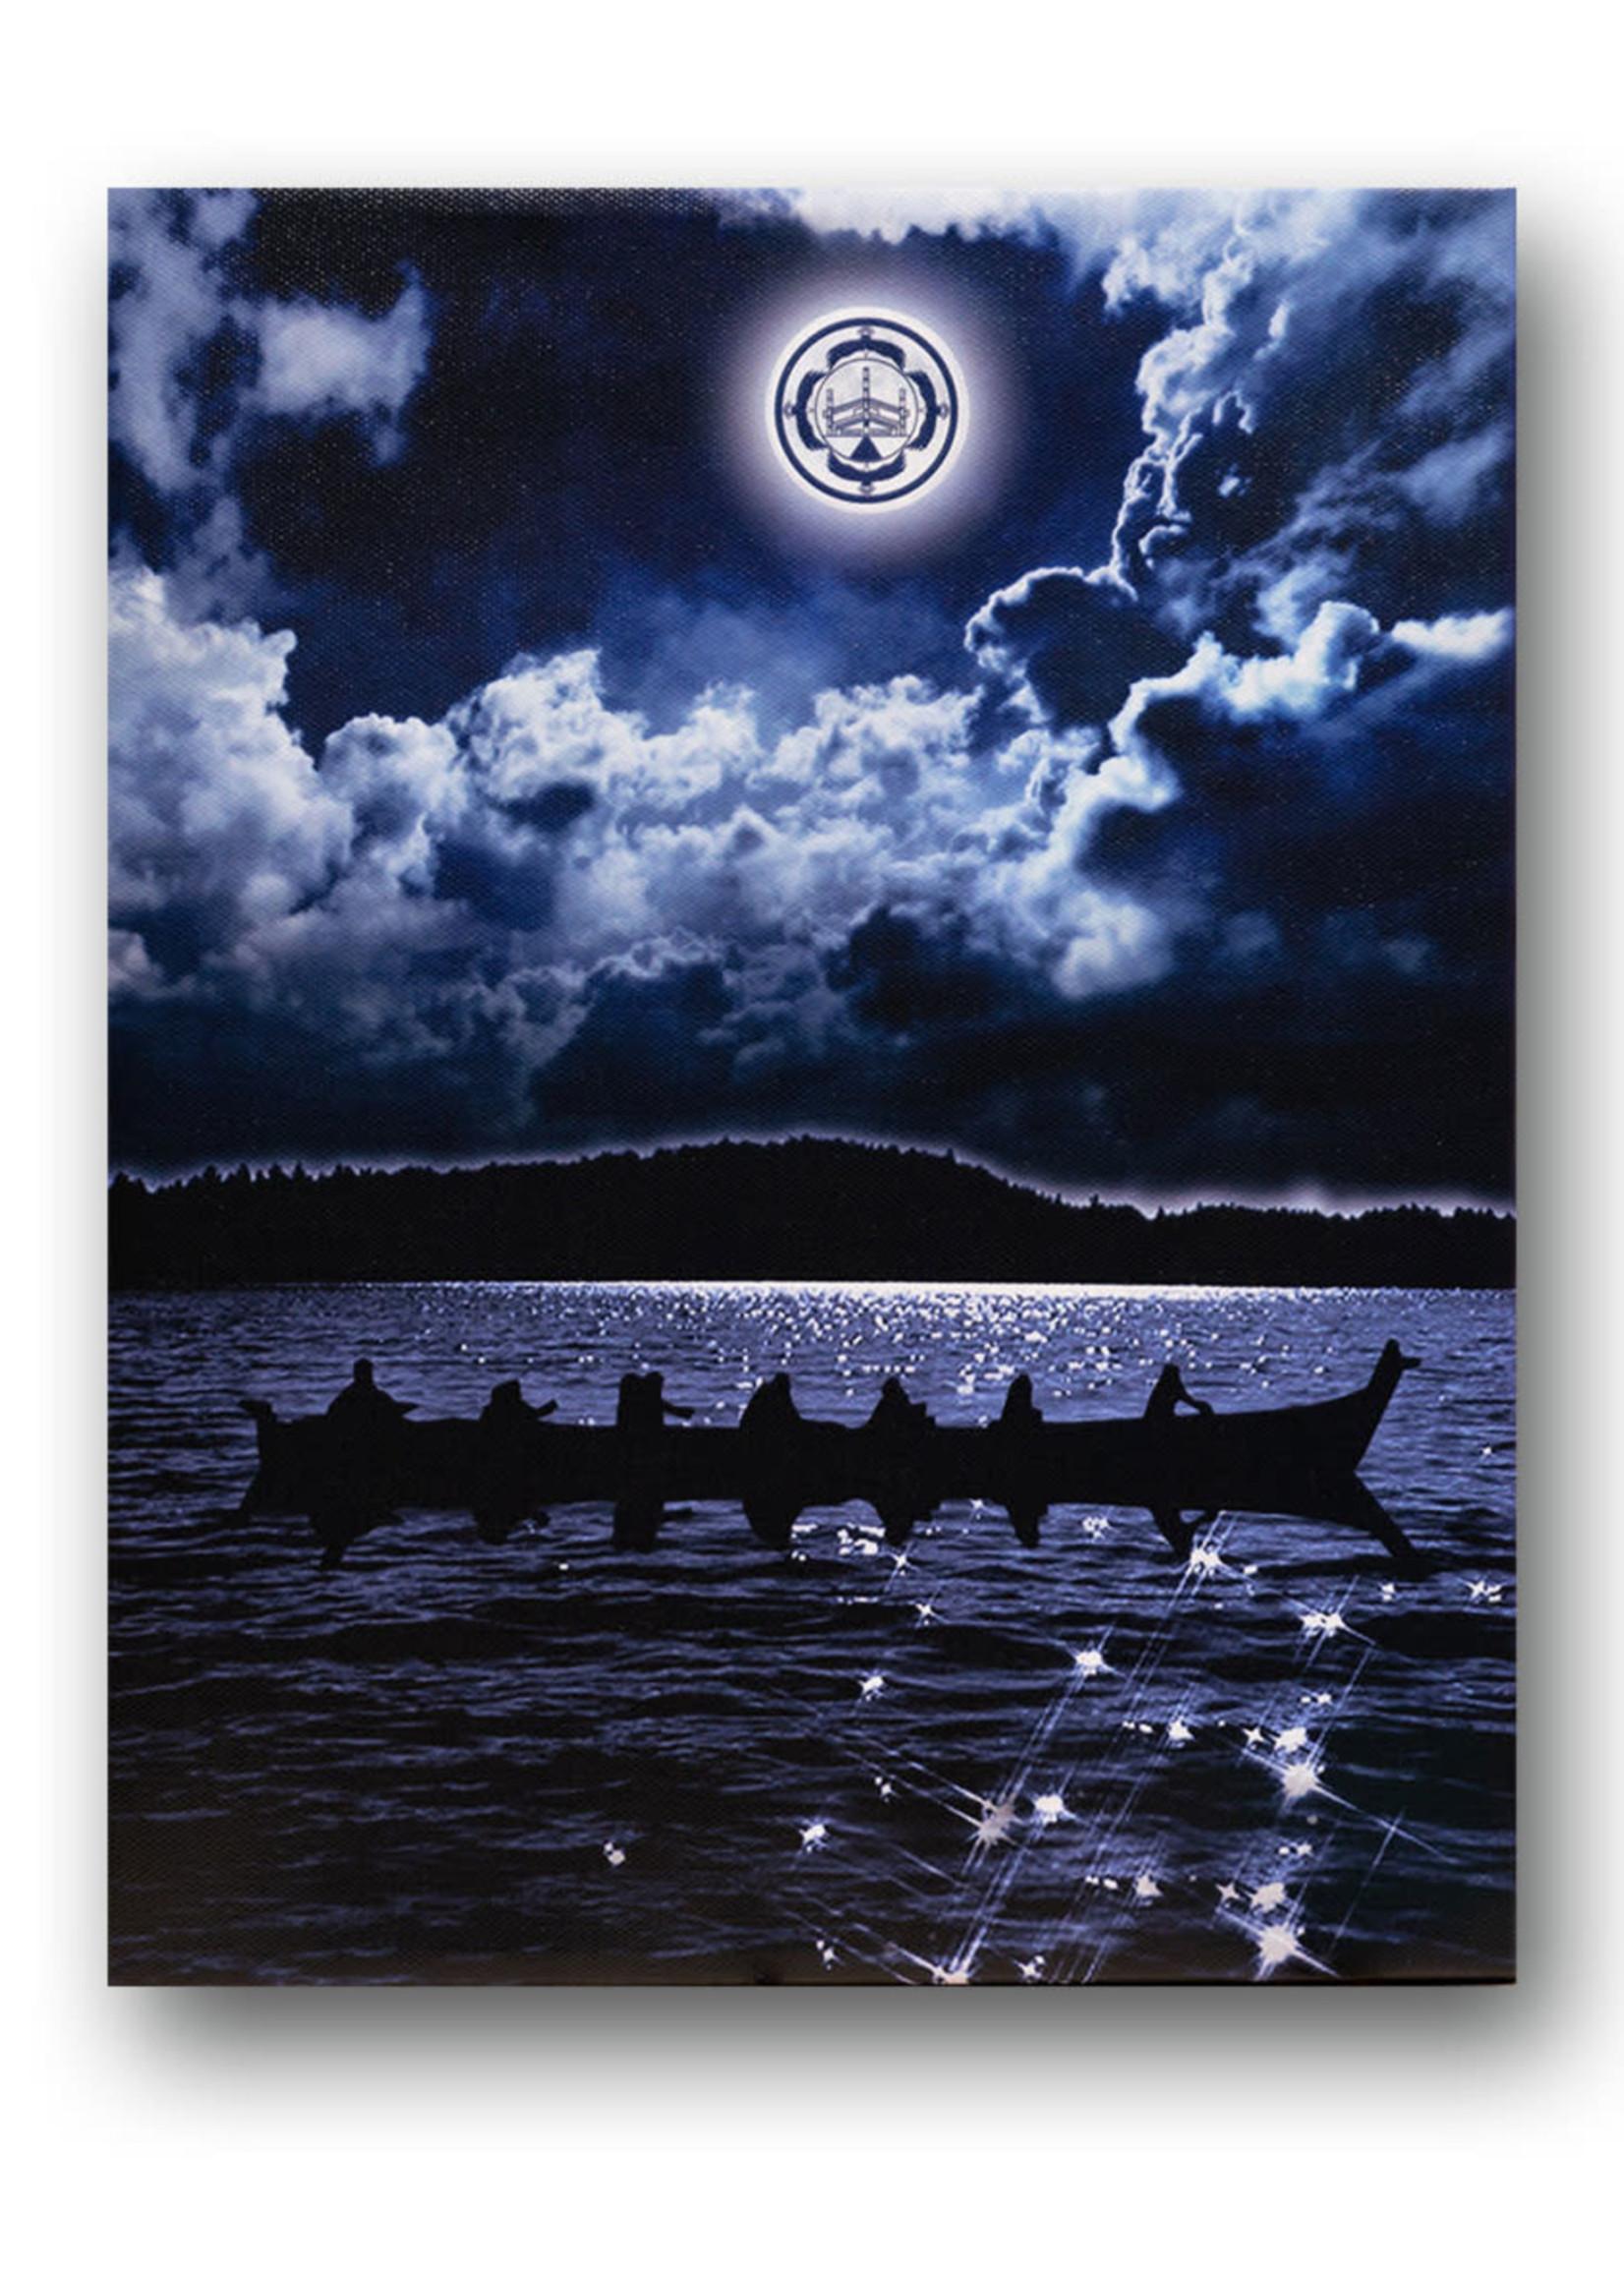 Circle of Eagles Kwa Kwem Tn by Moonlight Canvas 16x20 (SOLD)